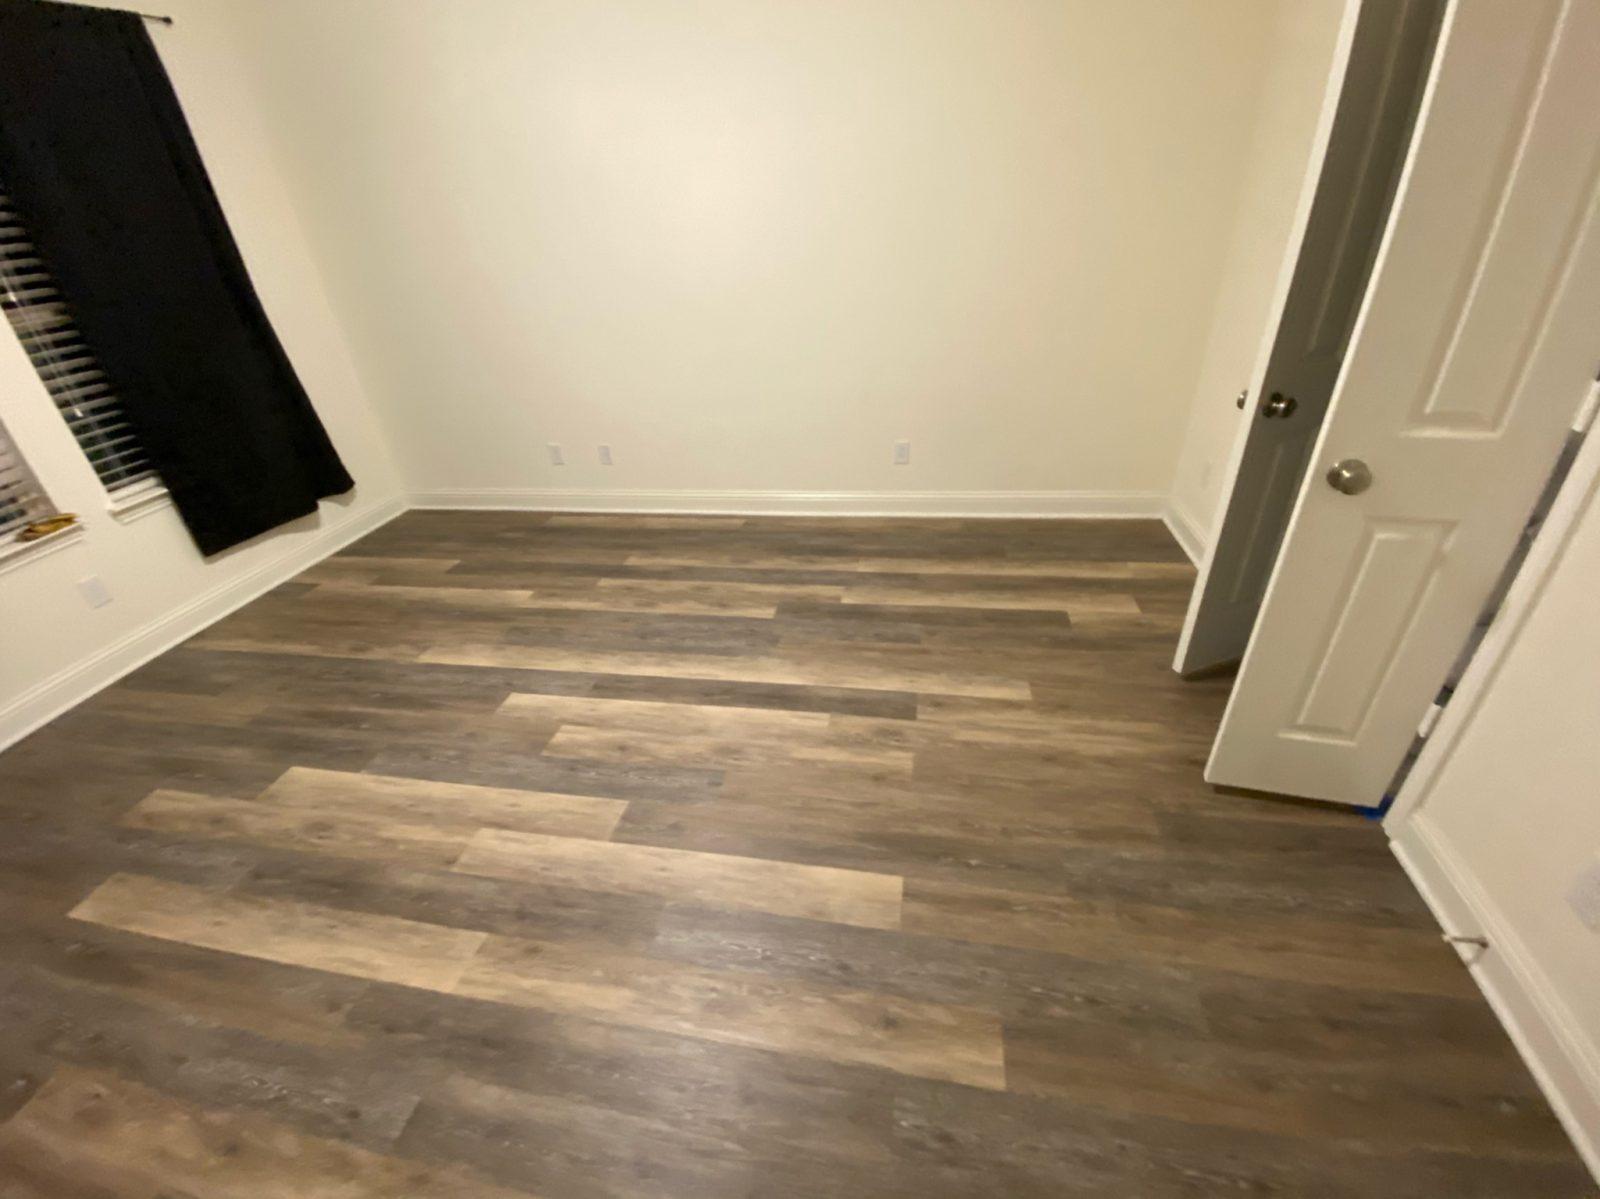 New Luxury Vinyl Plank – Prosper, Texas